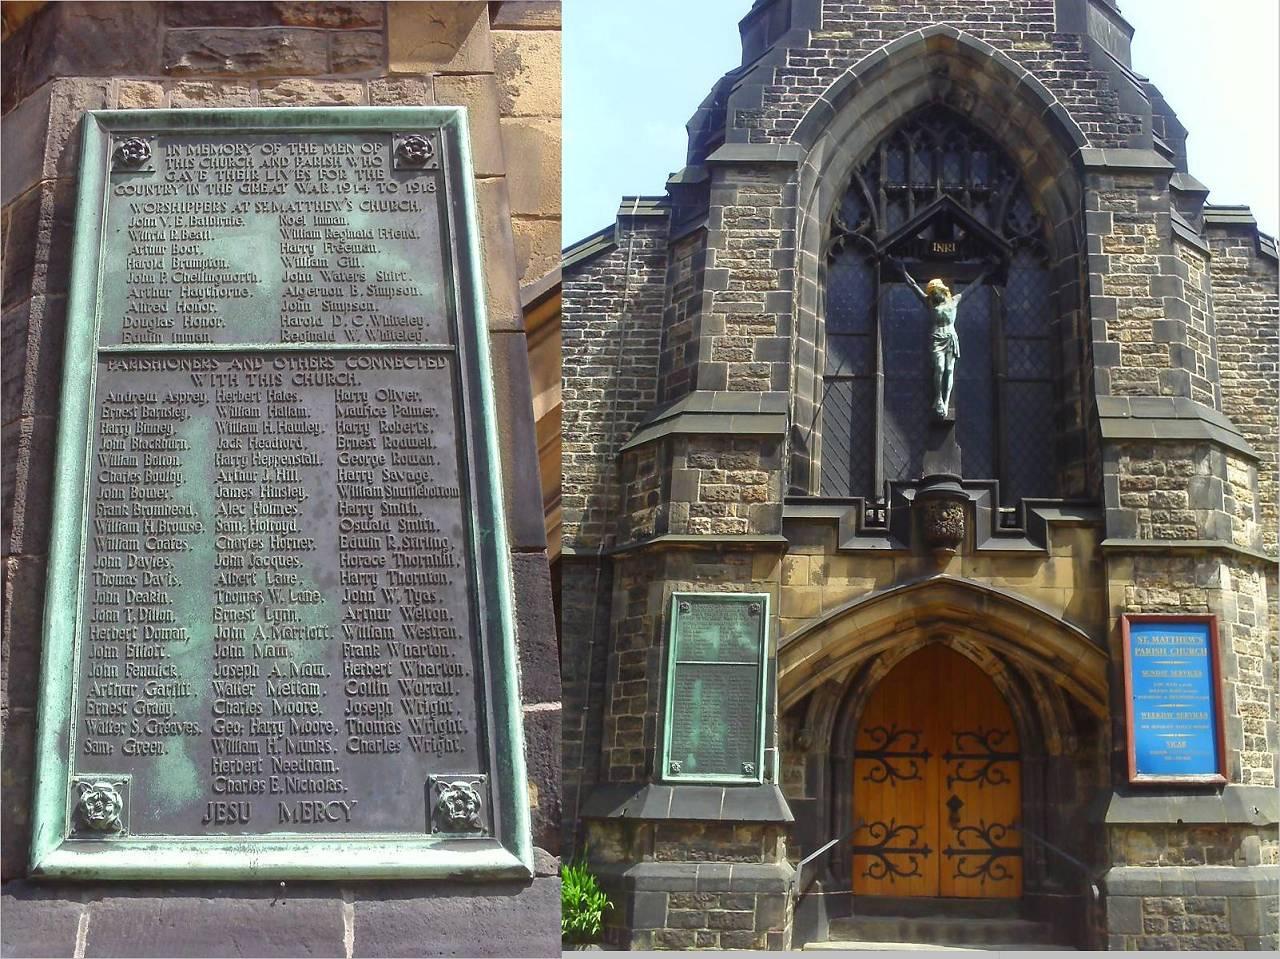 st matthews church carver st_(1280_x_1024).jpg